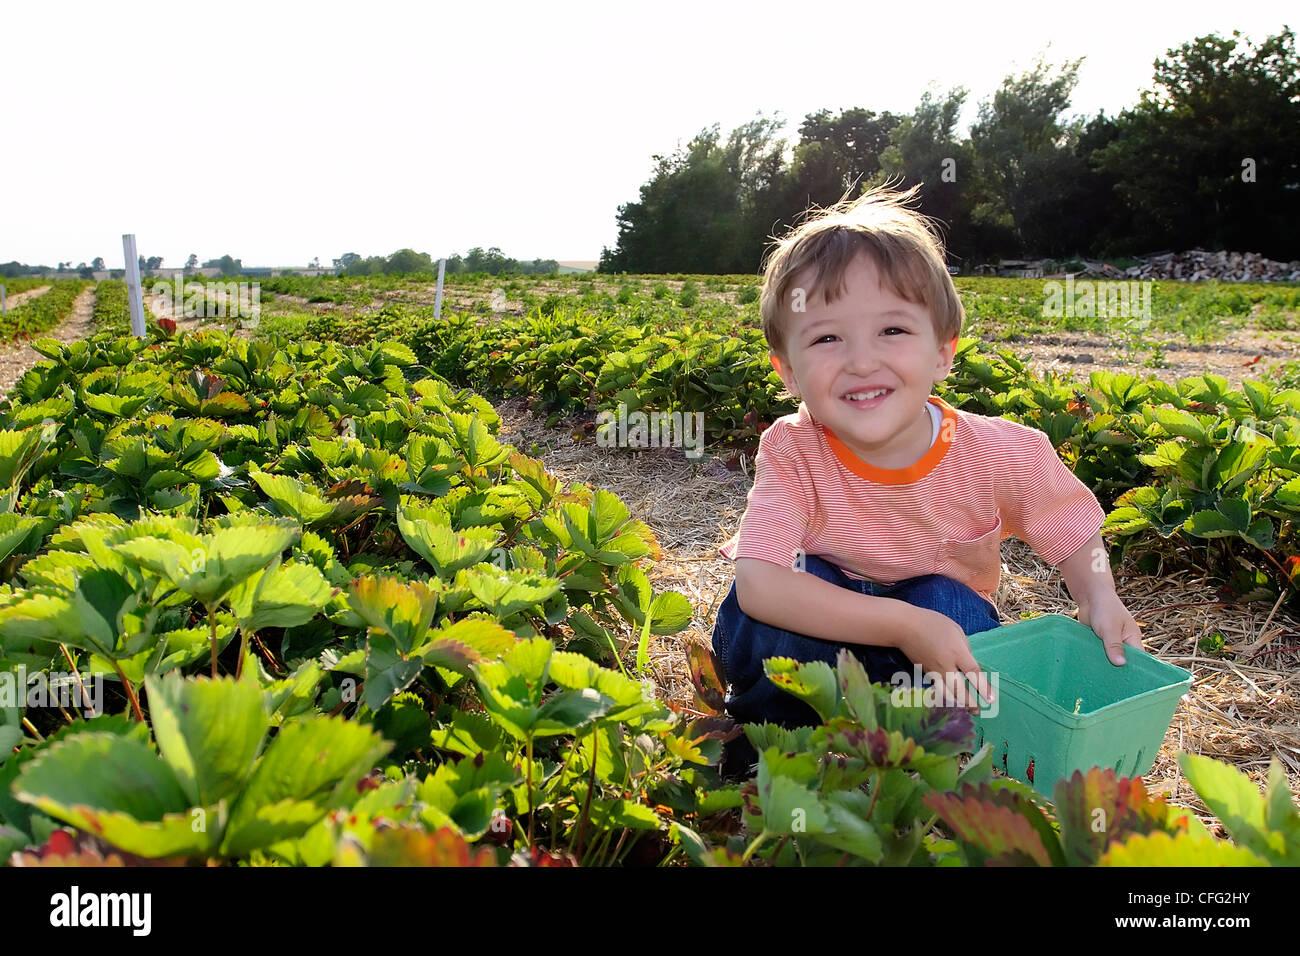 Young Boy Picking Strawberries, Uxbridge, Ontario Stock Photo